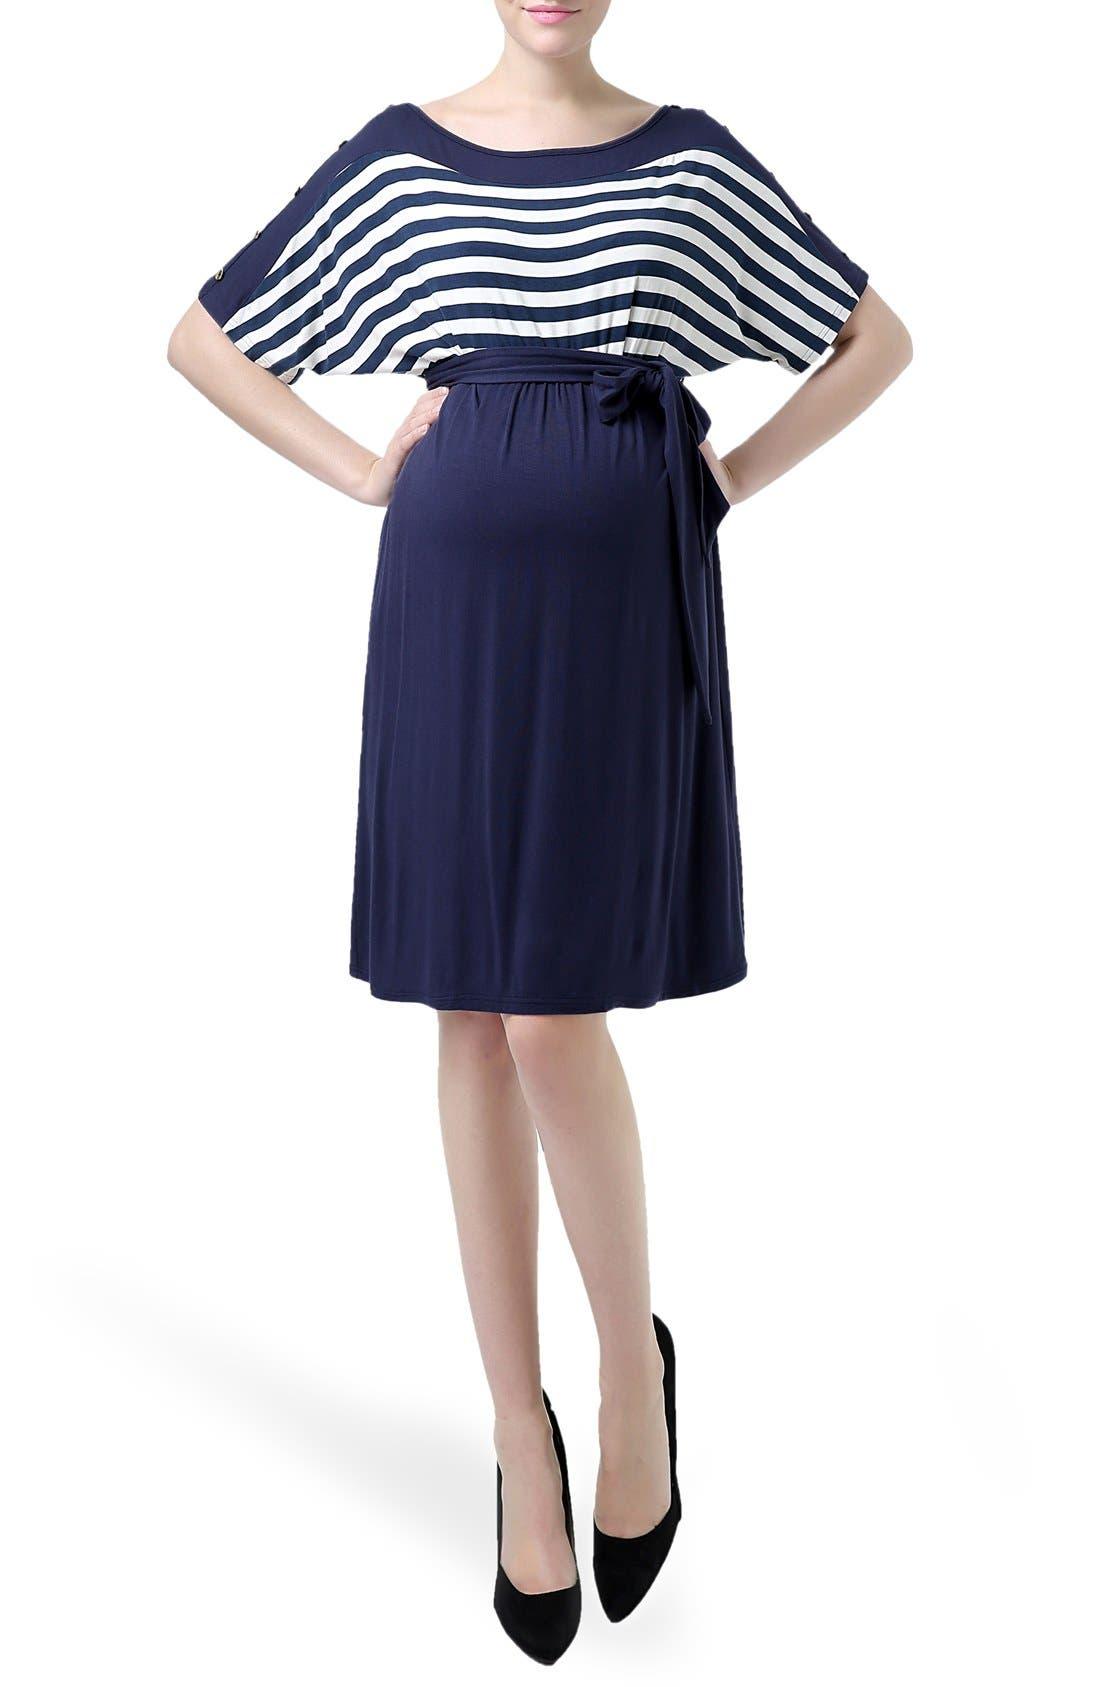 Main Image - Kimi and Kai 'Willow' Stripe Maternity Dress